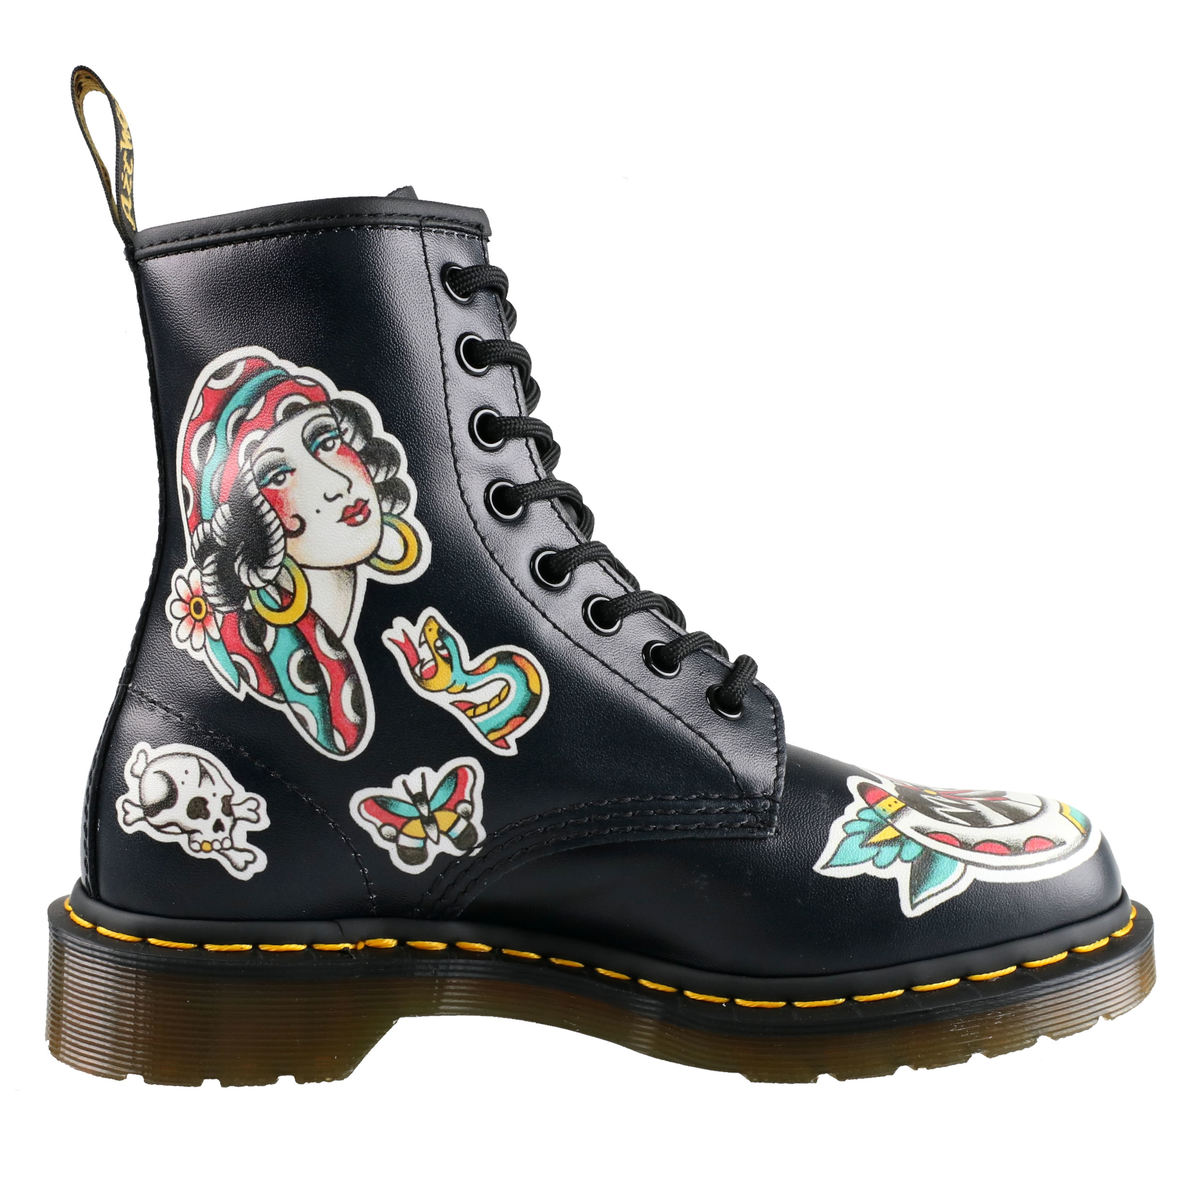 82c86696a9bd topánky Dr. Martens - 8 dierkové - 1460 - Chris Lambert - Black   Multi